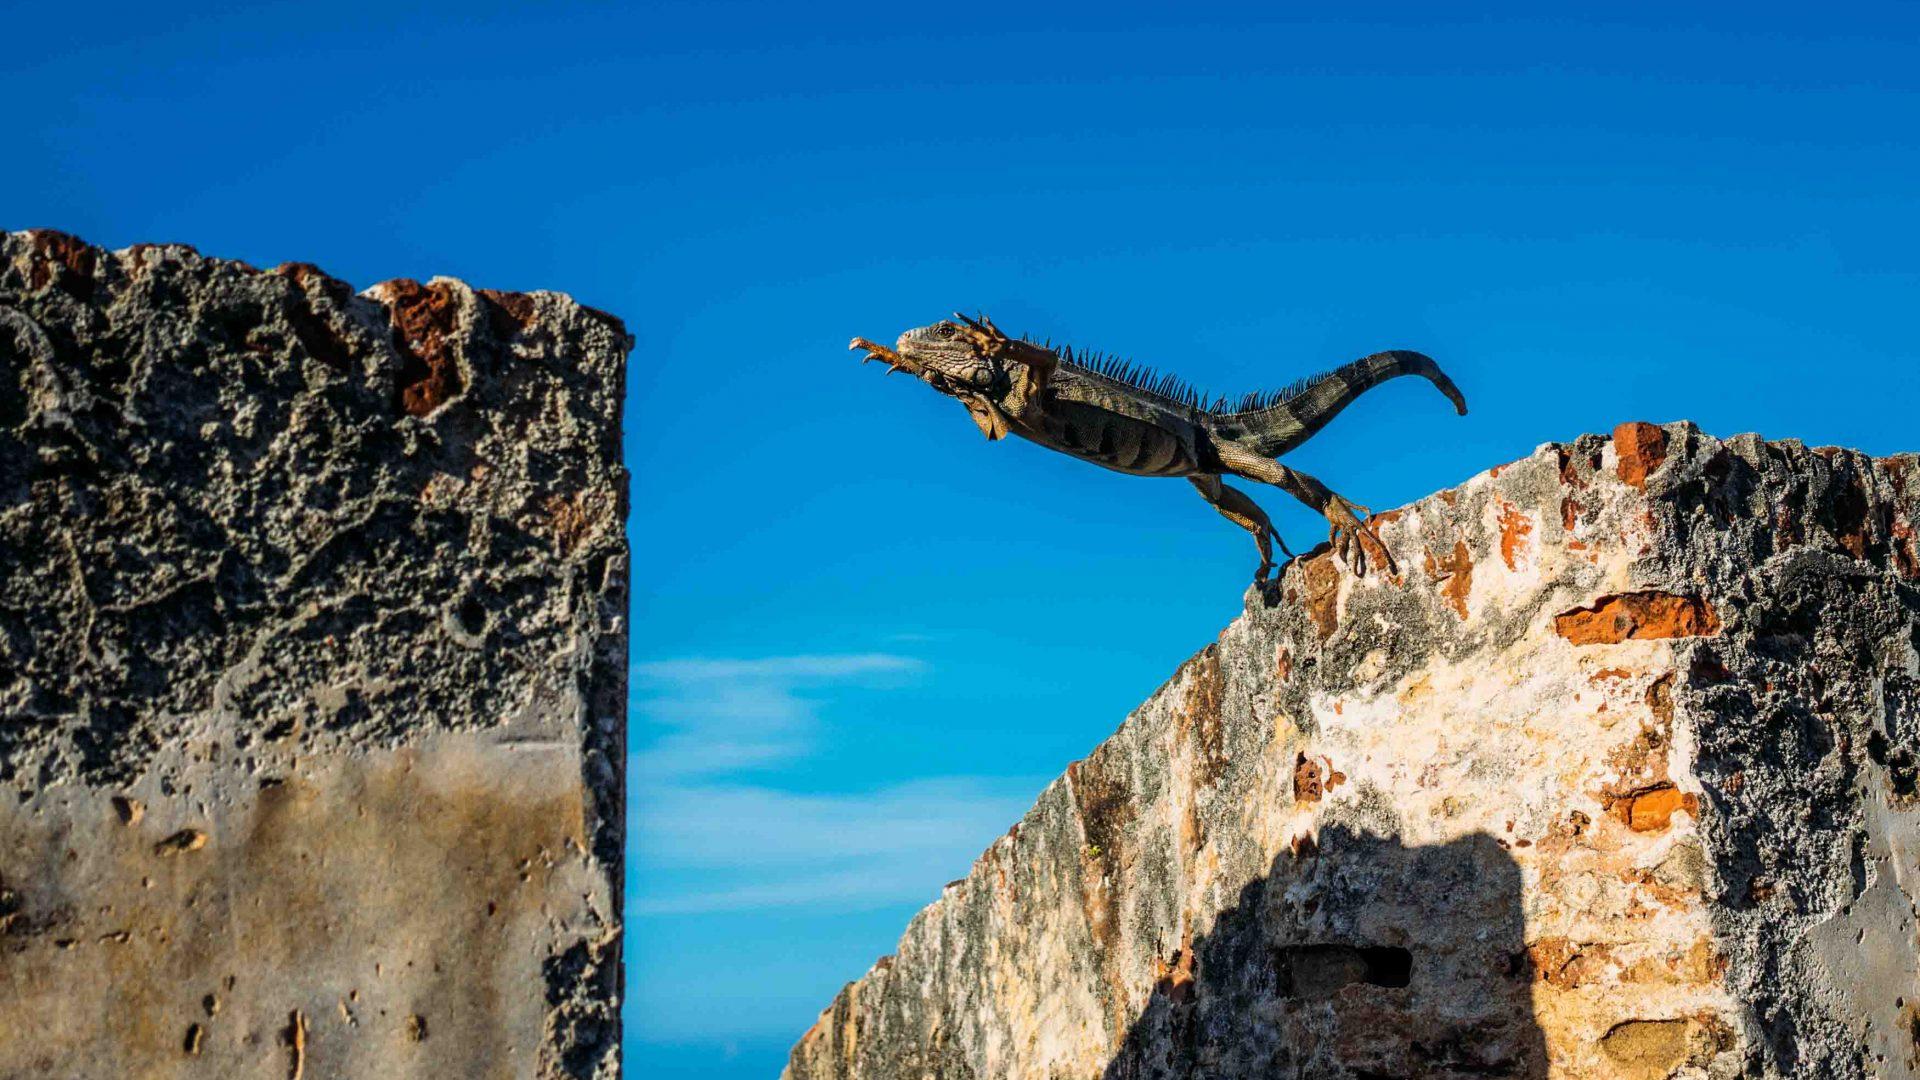 An iguana in Puerto Rico.